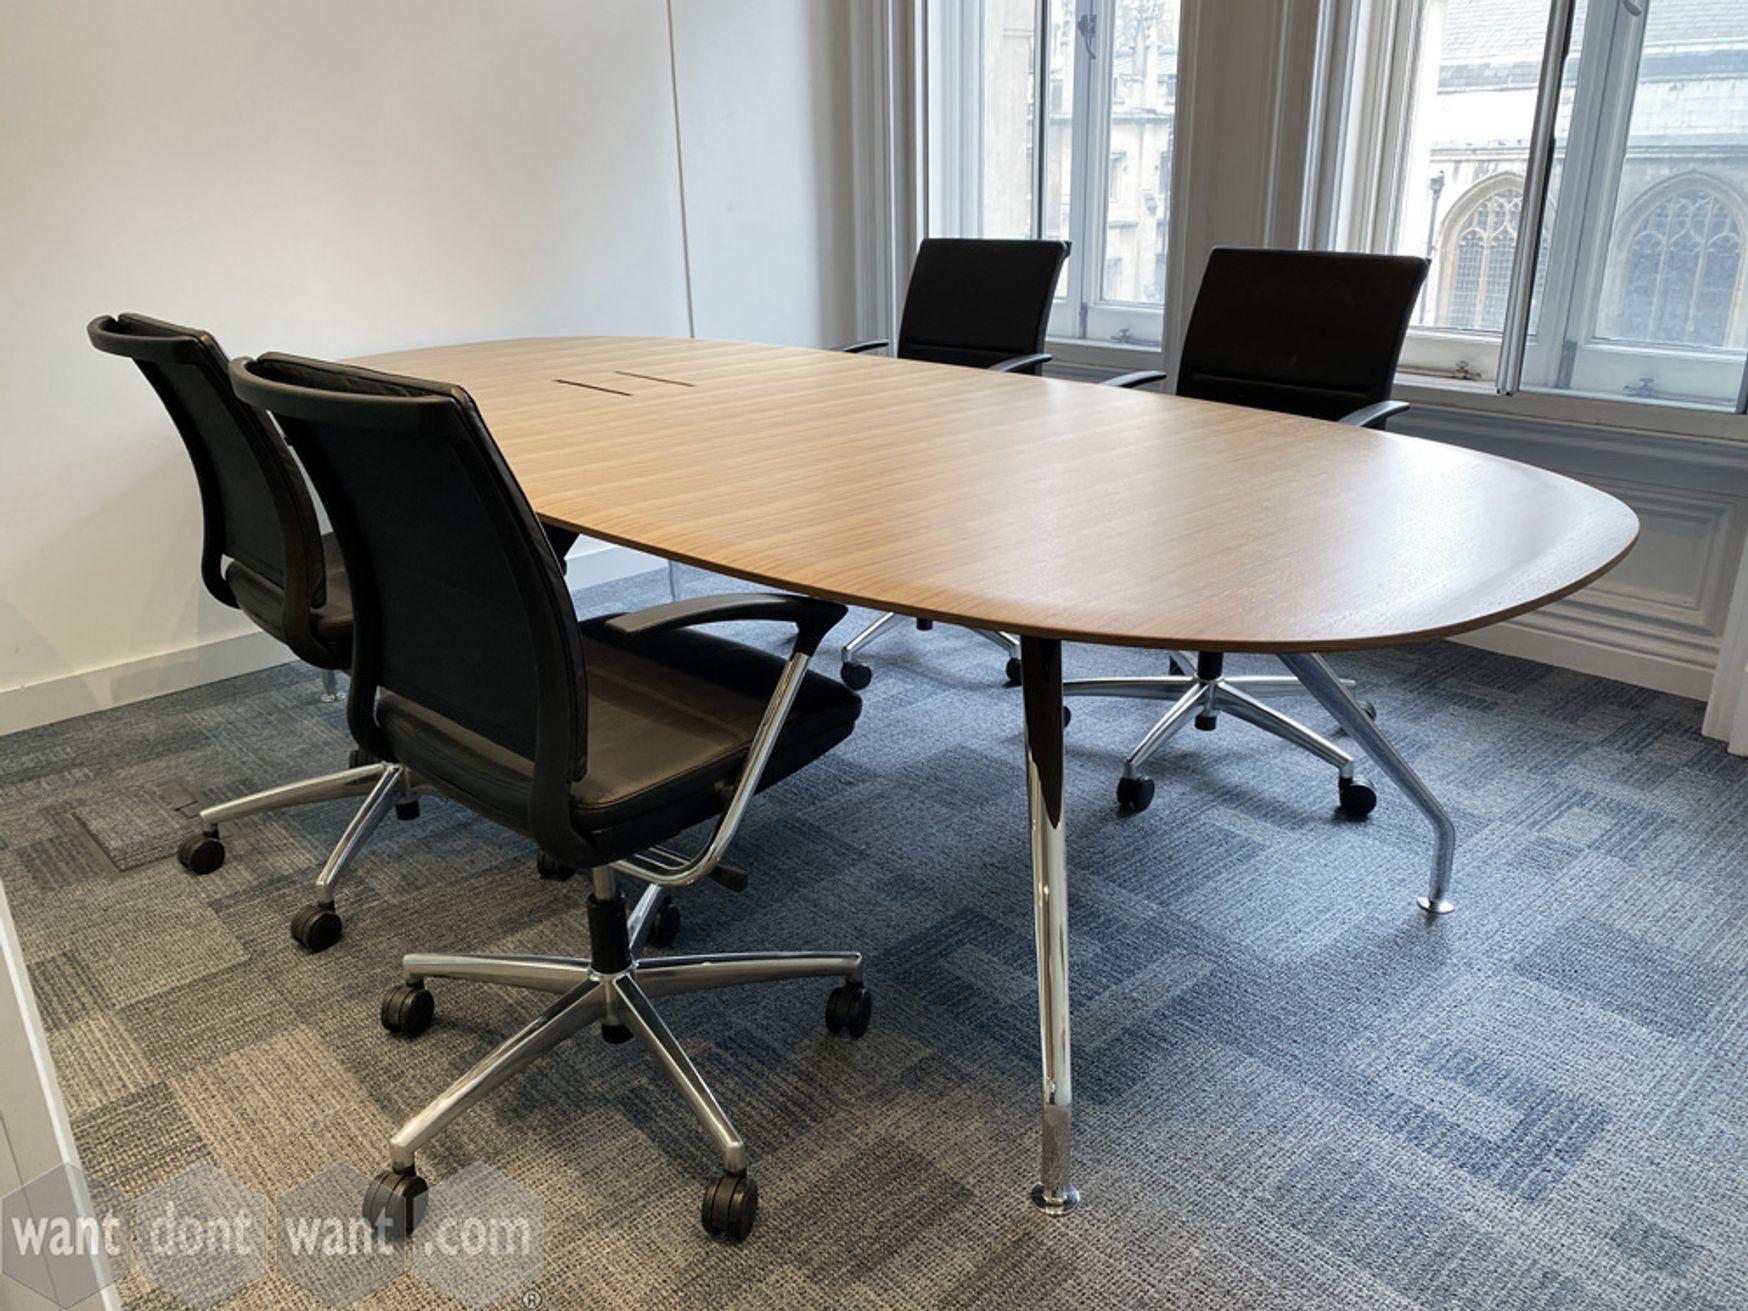 Used modern meeting table in light walnut veneer with splayed chrome legs